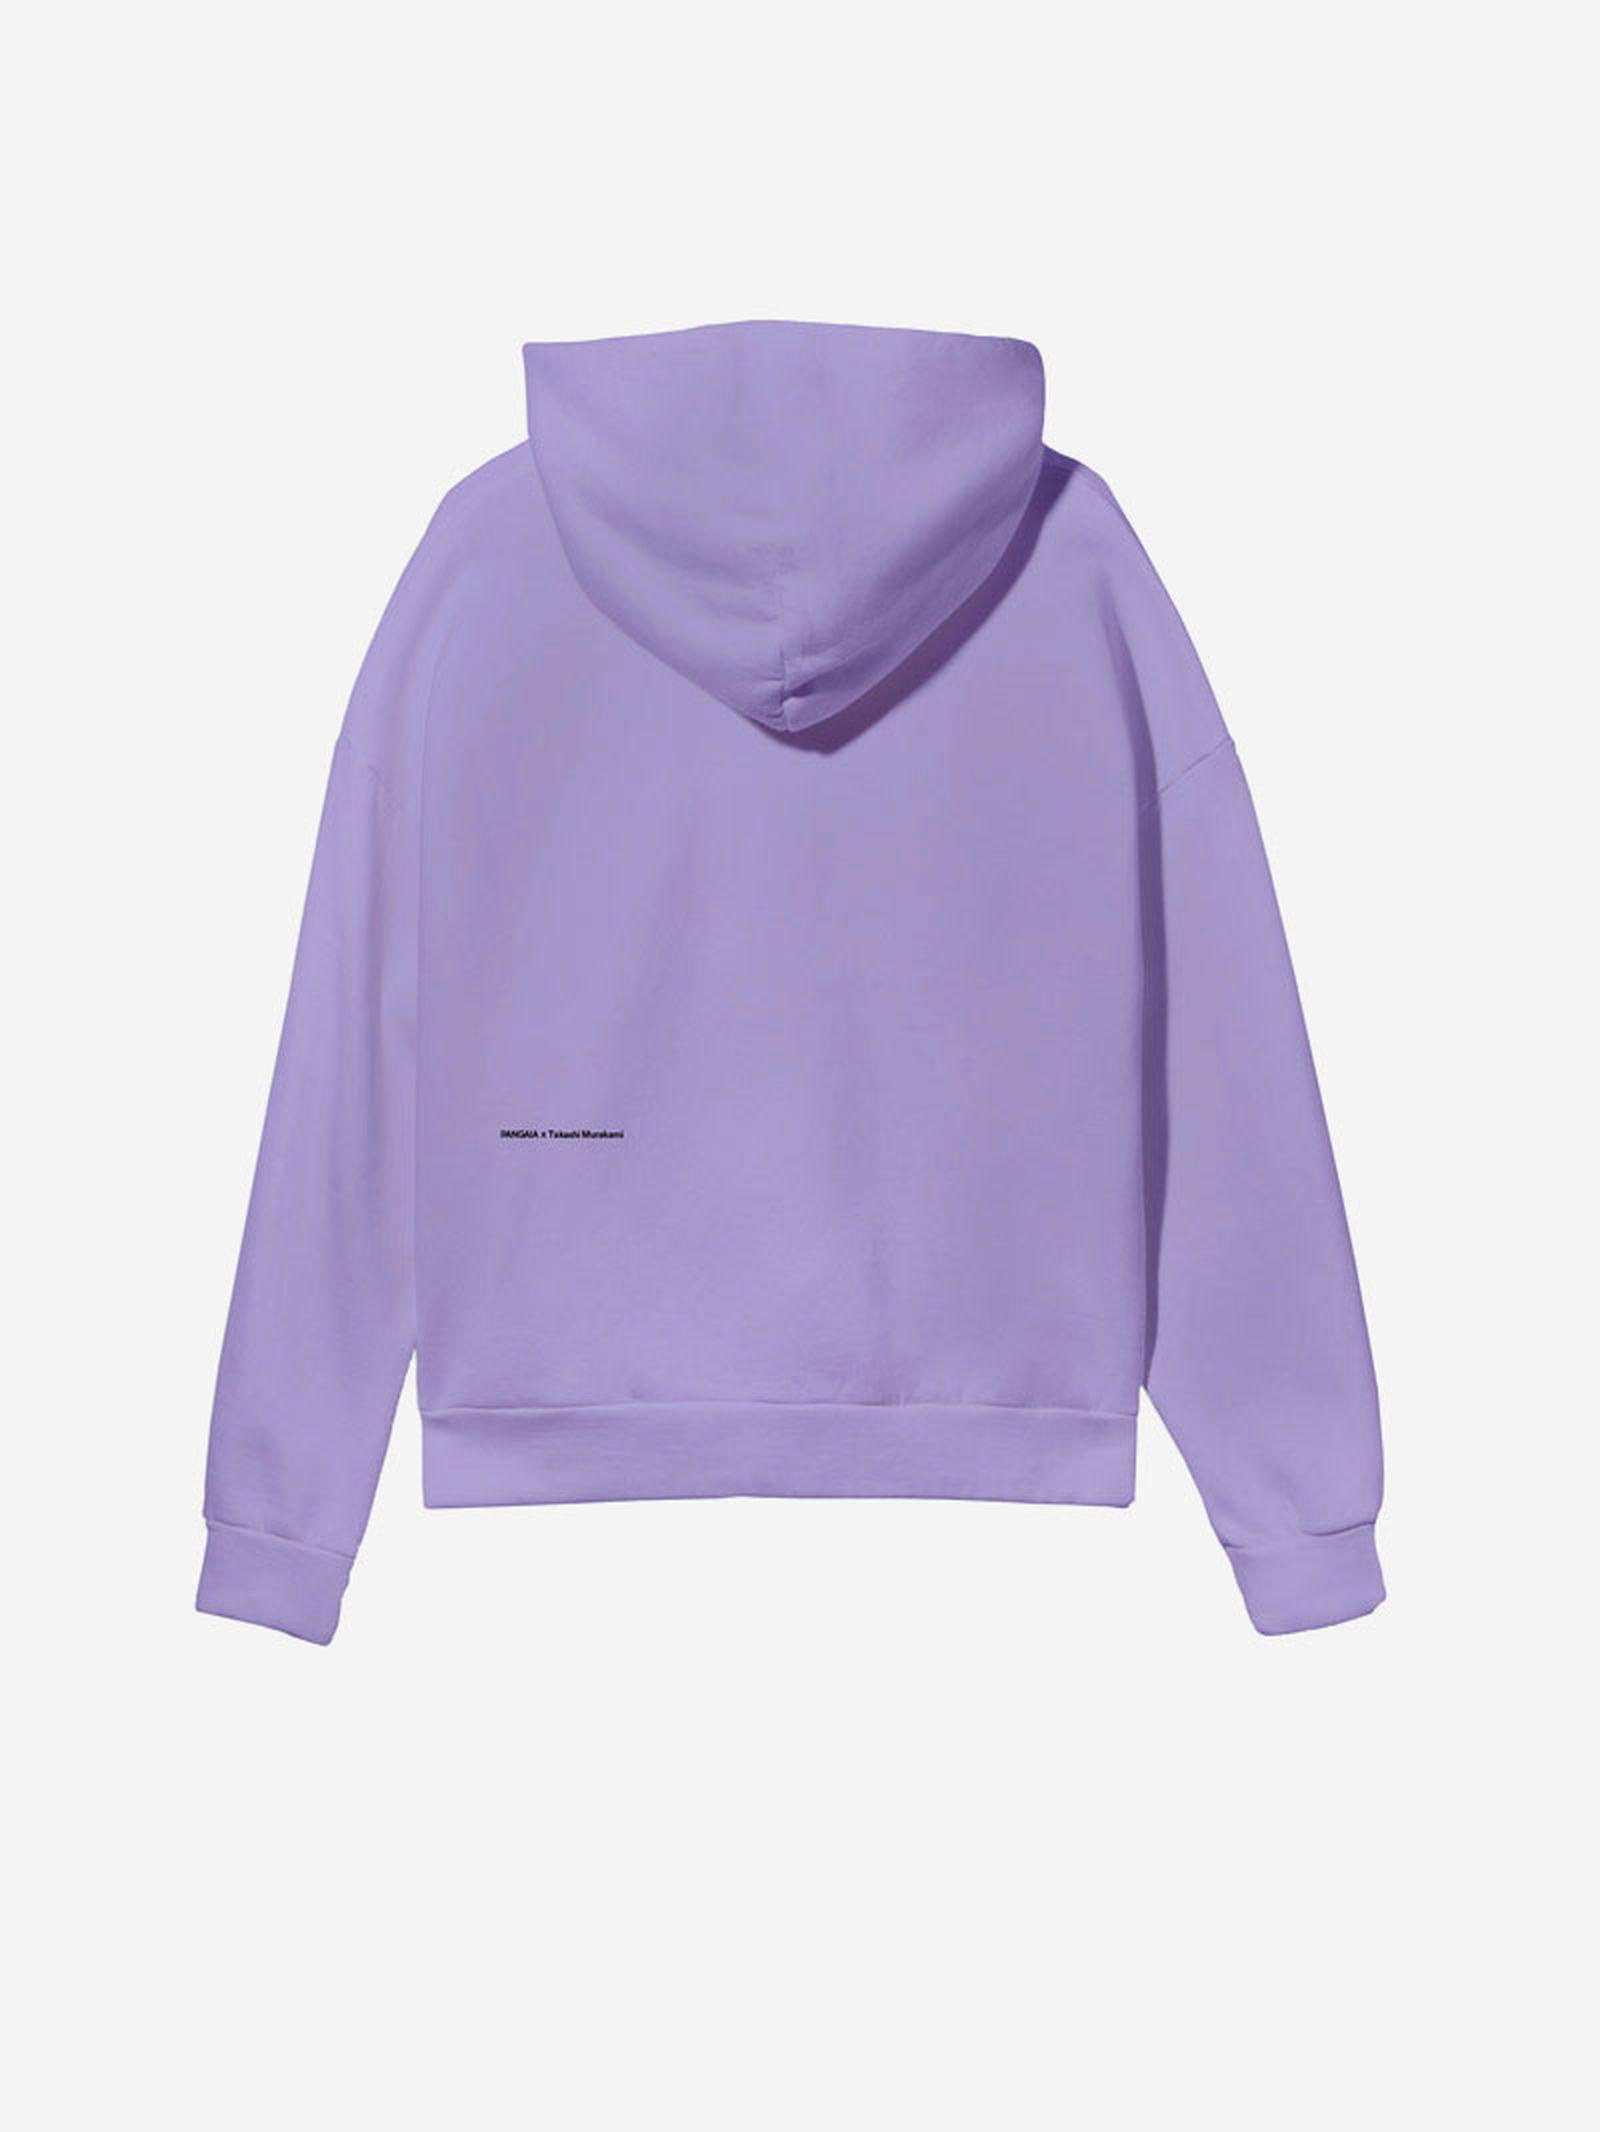 Takashi-Orchid-Purple-Back-edit